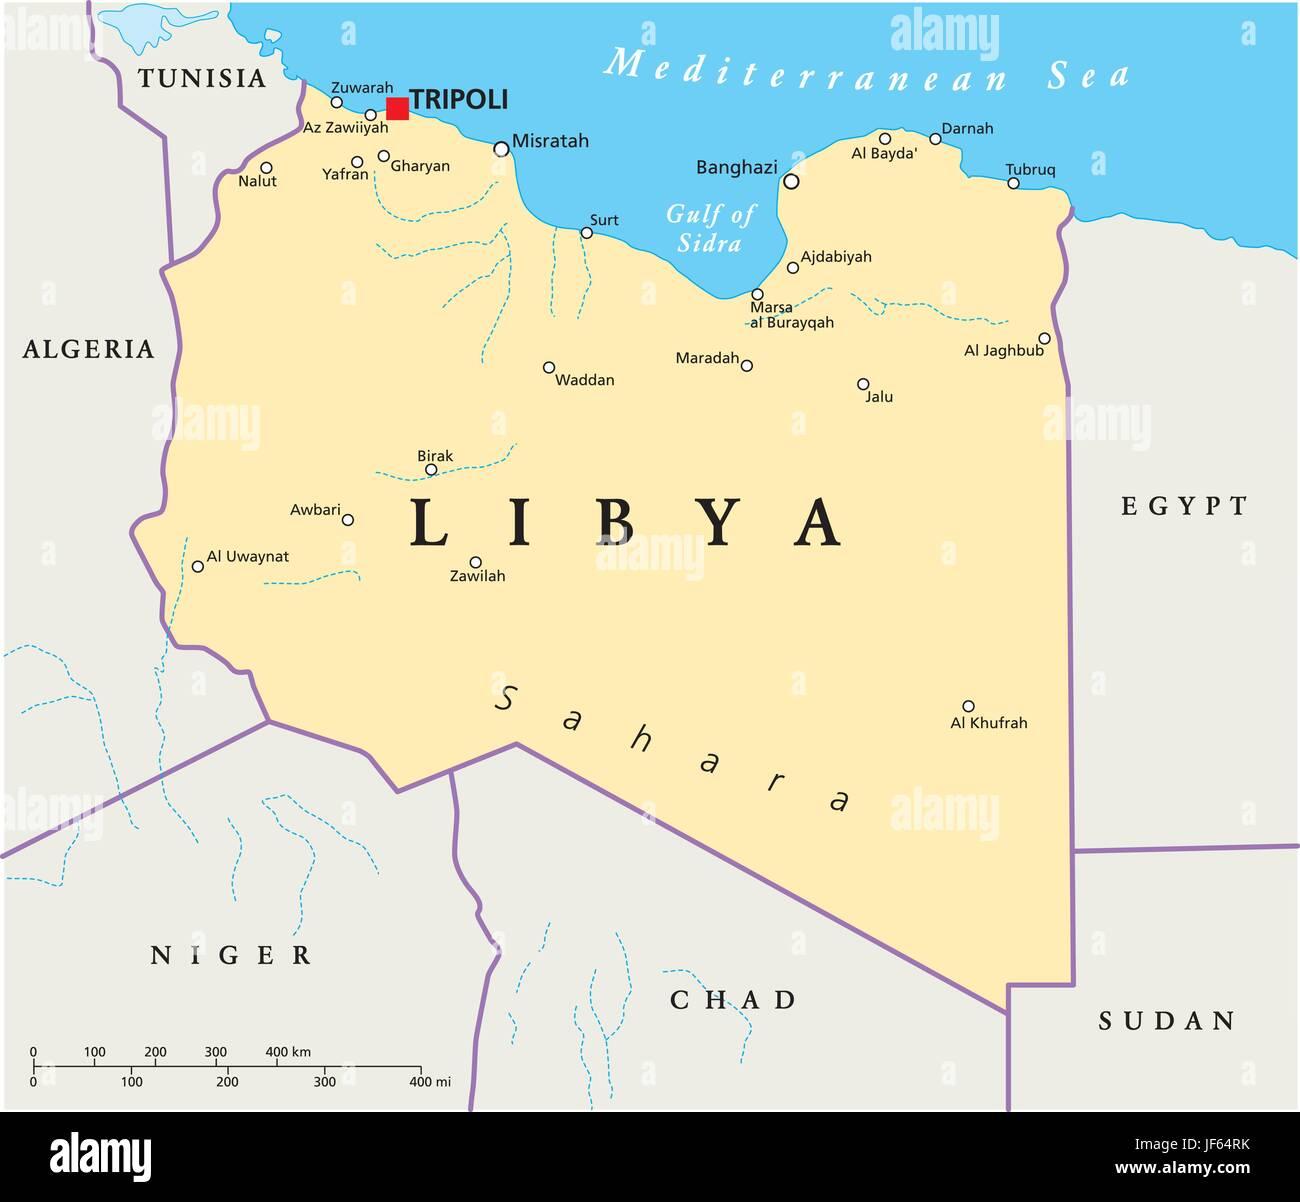 libya map atlas map of the world tripoli desert wasteland